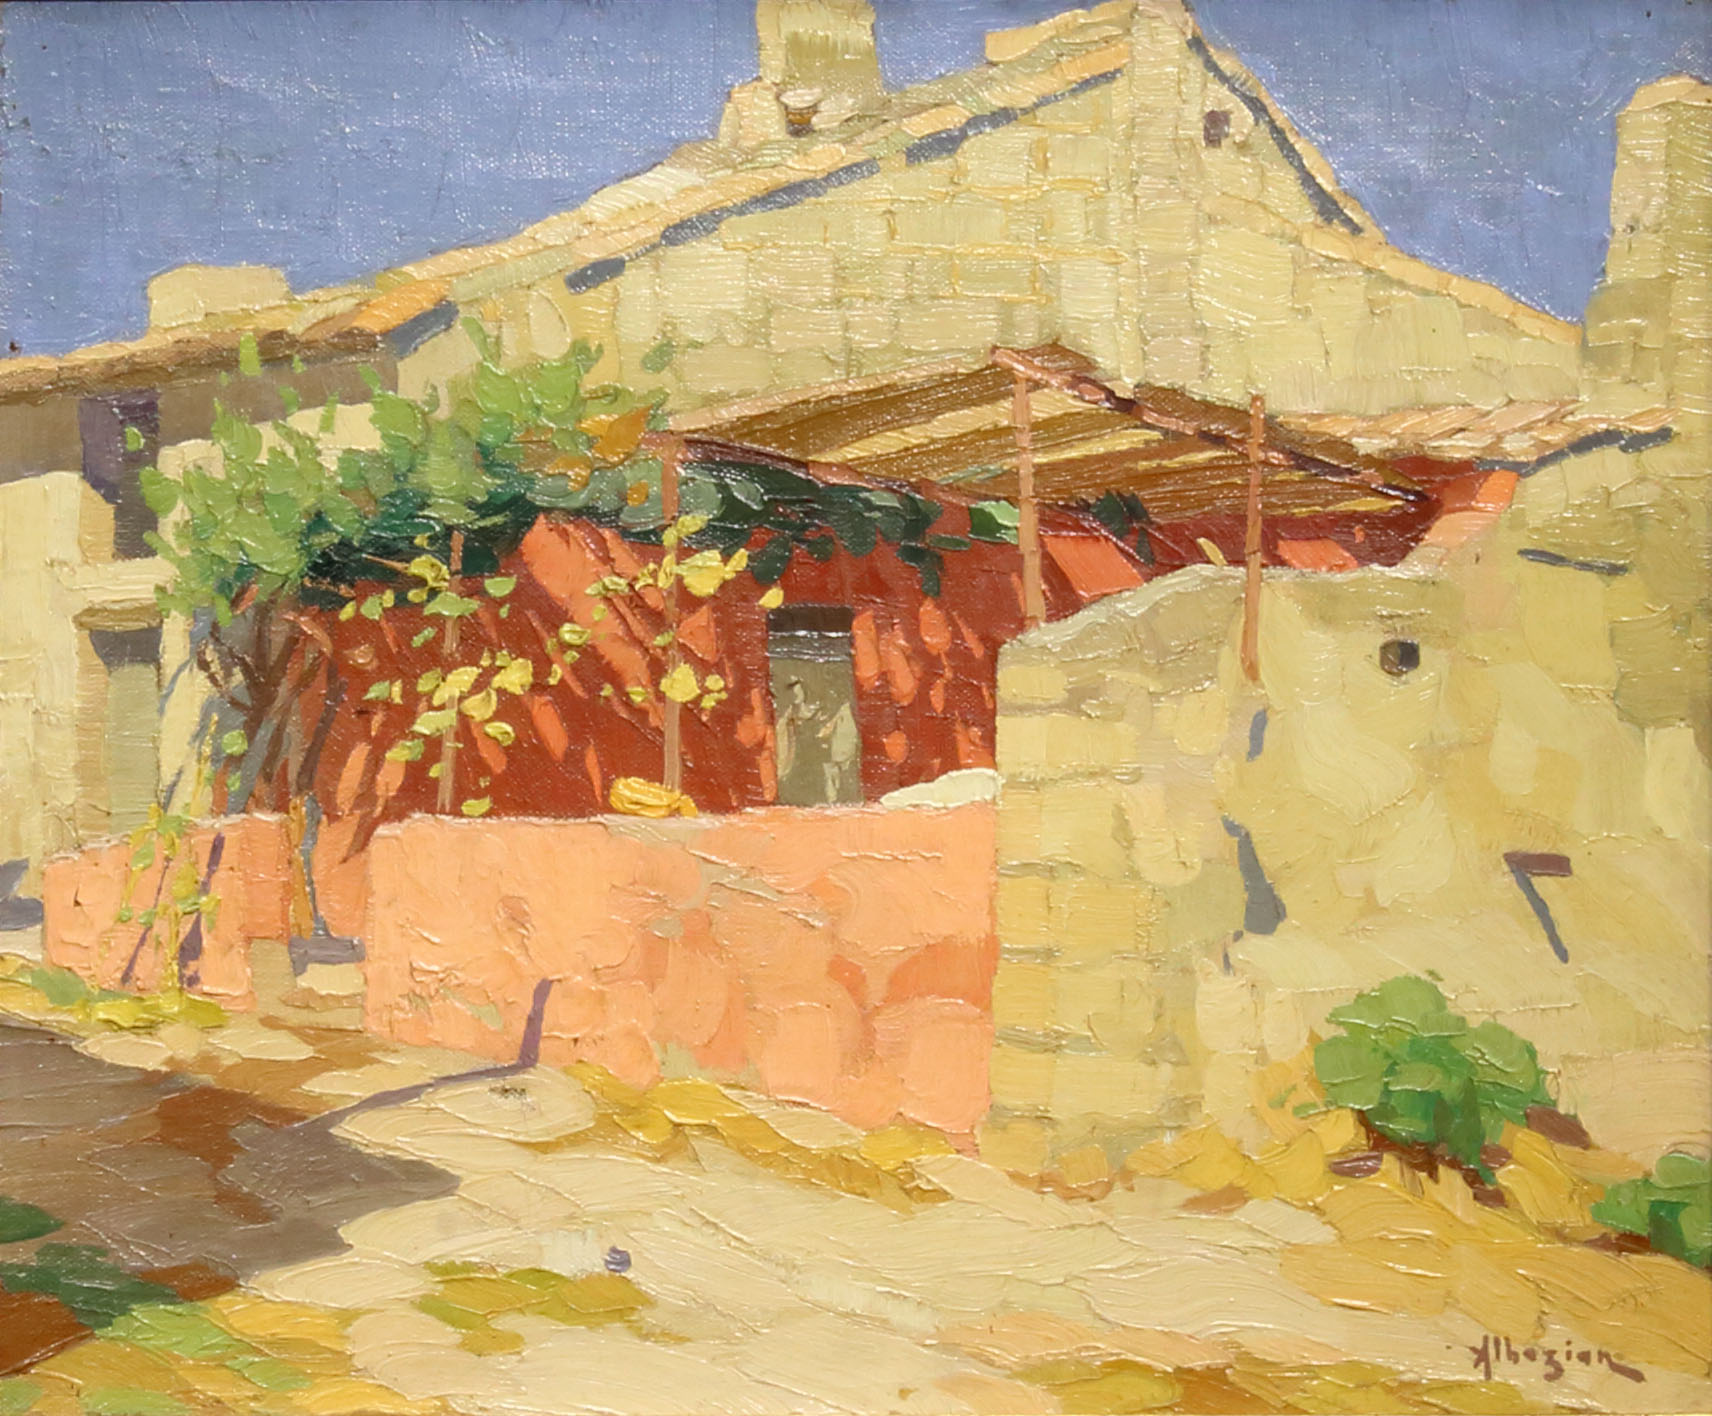 Ohannes Alhazian, La terrasse Ombragée, 15.5x20 inches, Oil on canvas